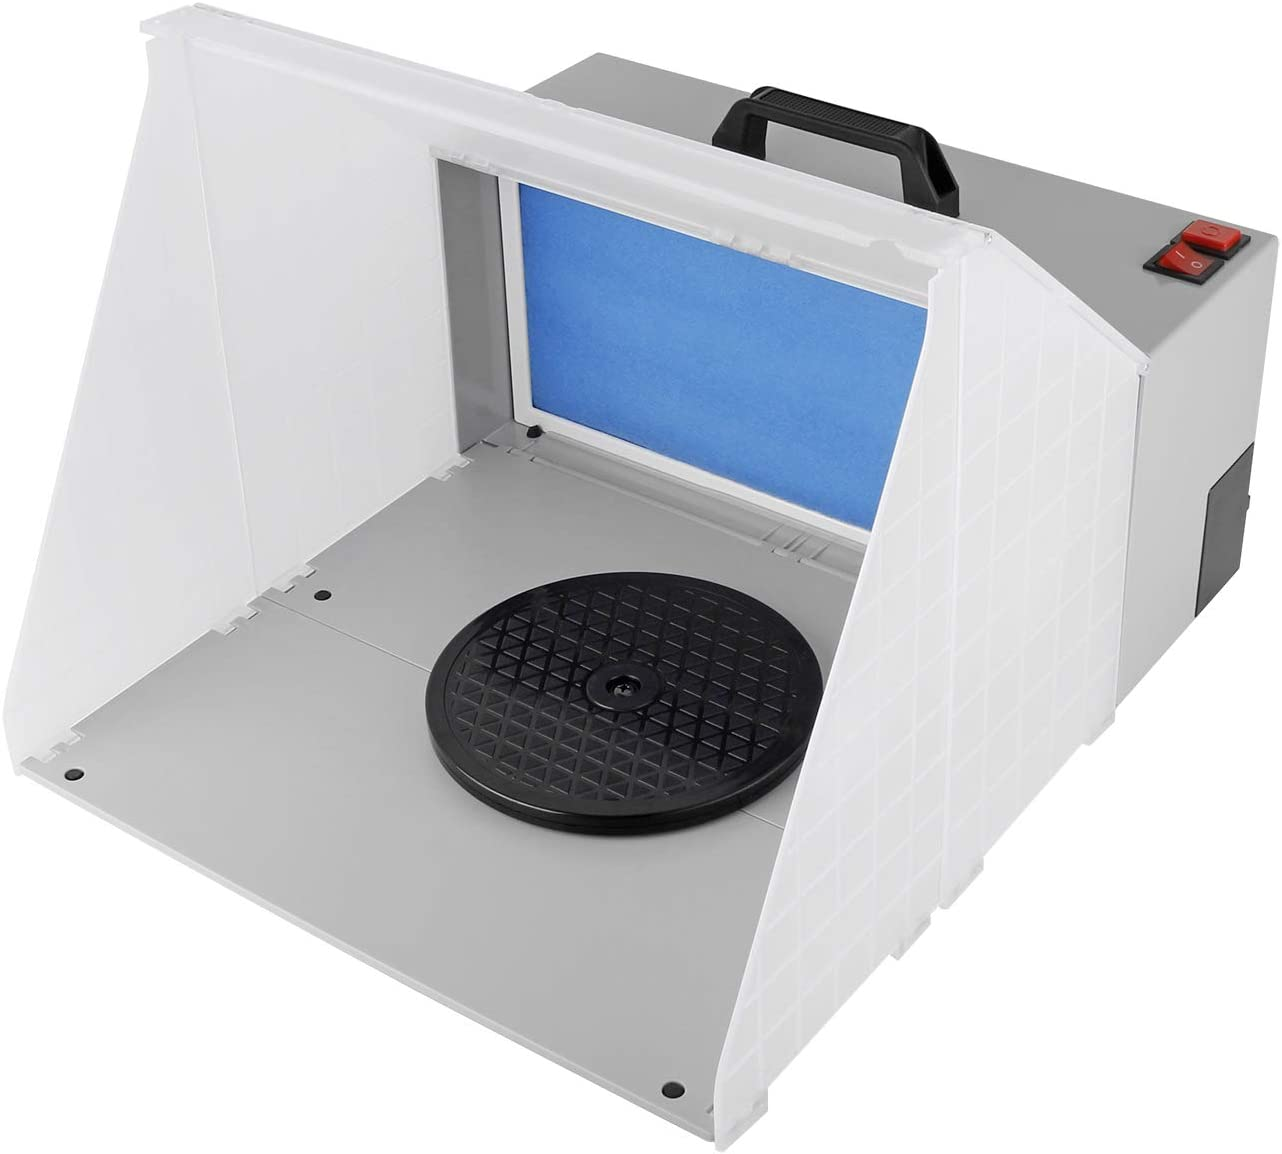 YAOBLUESEA Extractor de aerógrafo 3m³ / min Filtro de Color Vapor de Pintura W420 para neblina de Pintura Filtro de Recambio de Aire Exterior Aerosol de Aire Exterior